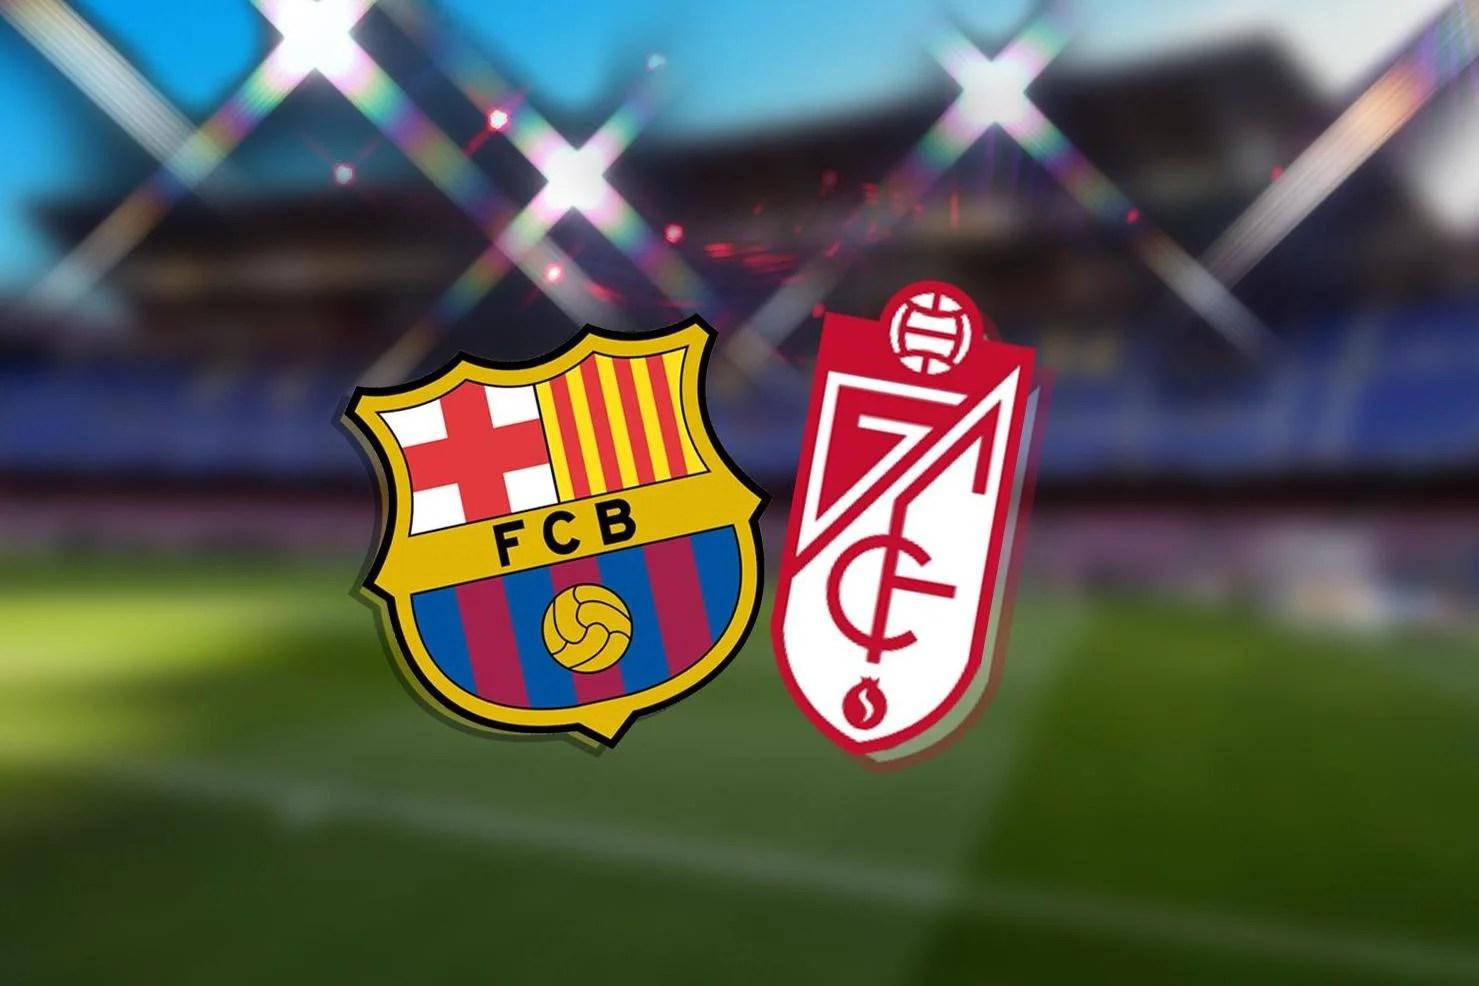 Barcelona Vs Granada Preview Laliga Prediction Tickets Tv Channel Live Stream H2h Odds Team News Internewscast